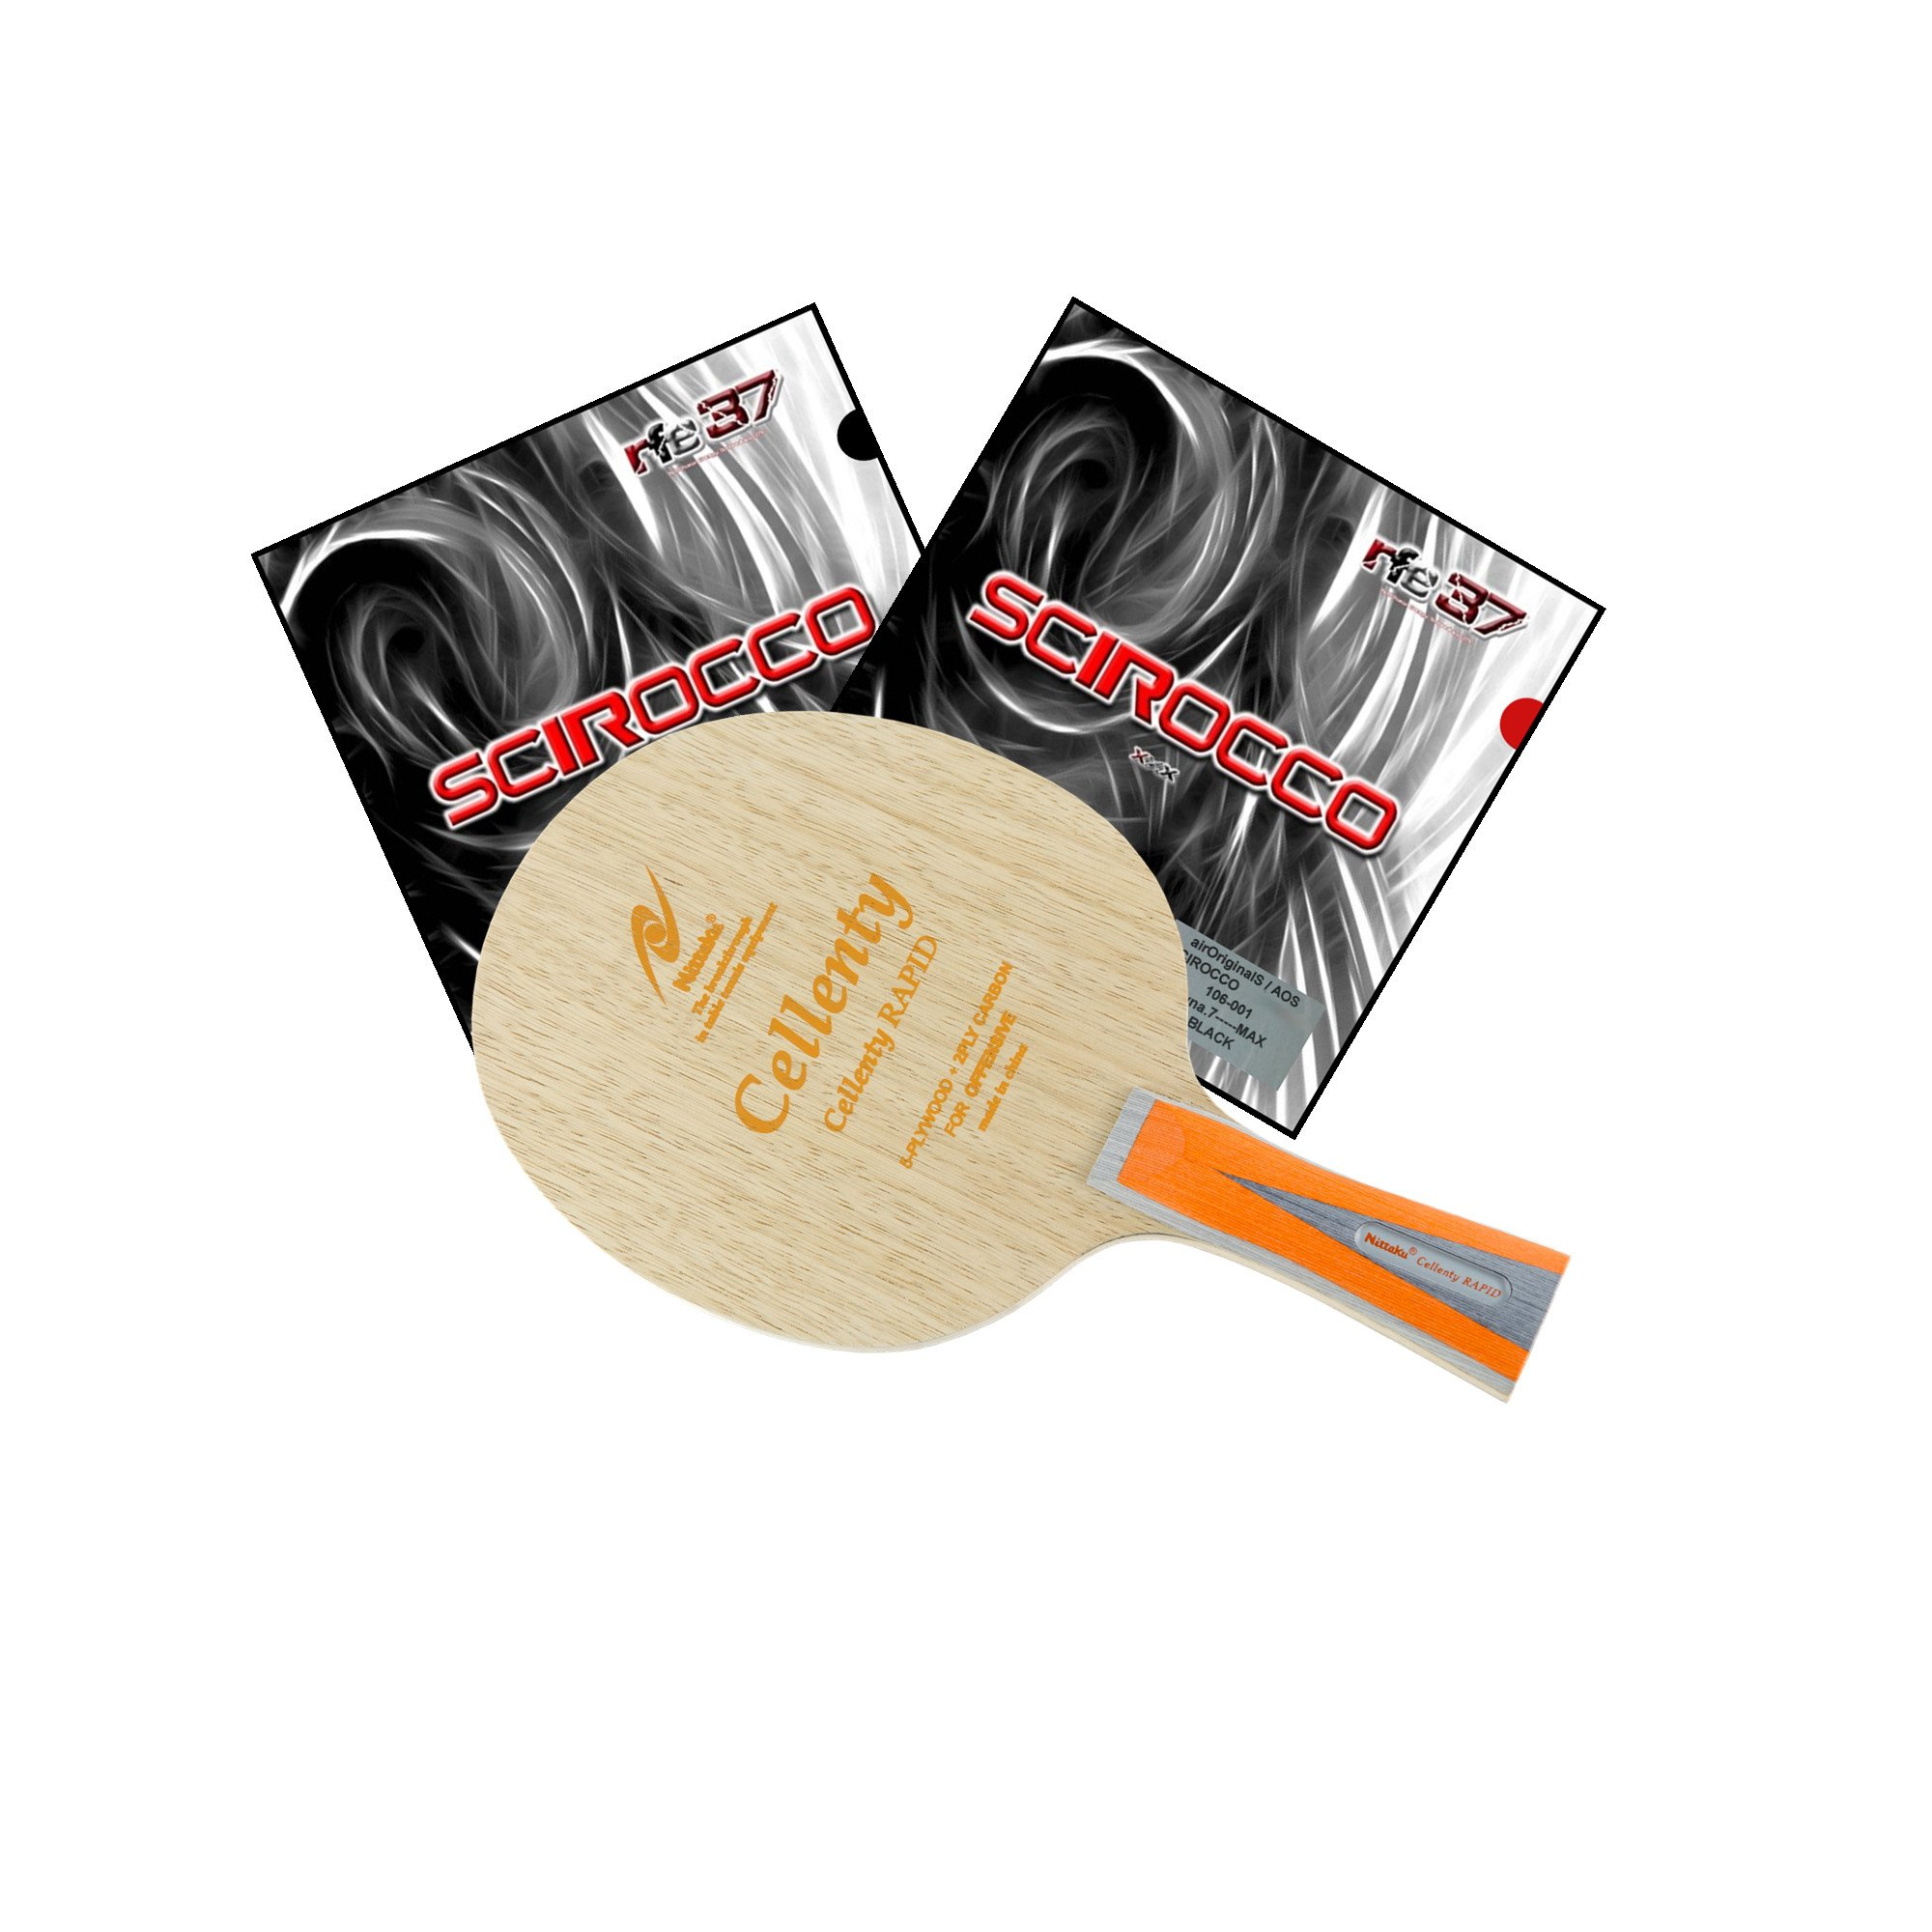 Nittaku Cellenty Rapid Carbon FL + Air Scirocco Table Tennis Racket